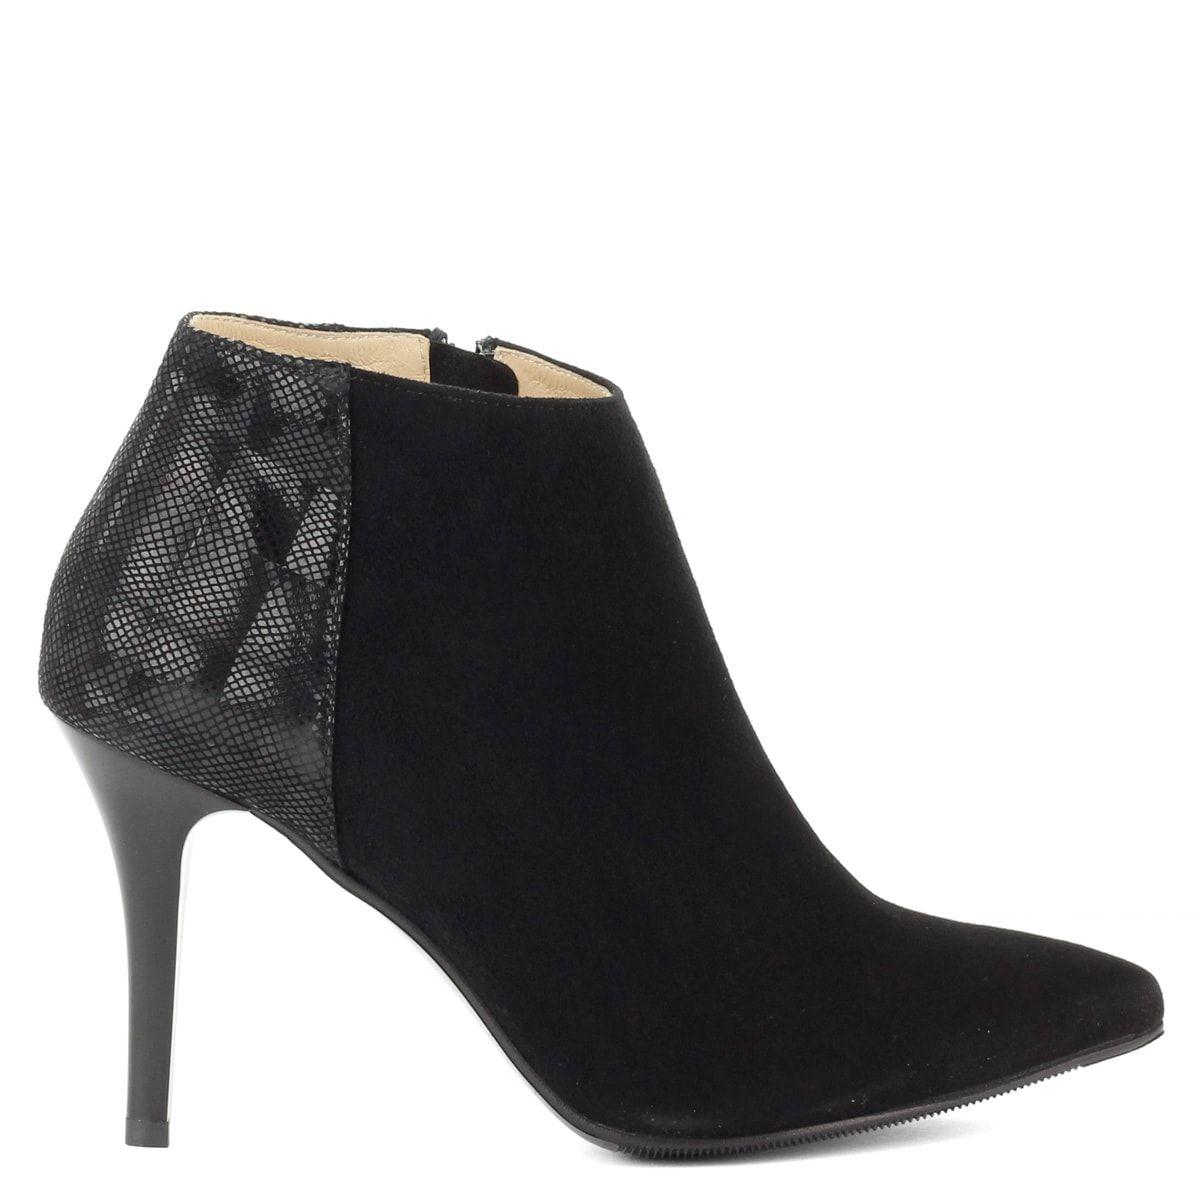 b0fb7bdf04 Anis fekete bőr bokacsizma - Elegáns magassarkú velúr bőr bokacsizma #boots  #divat #cipő